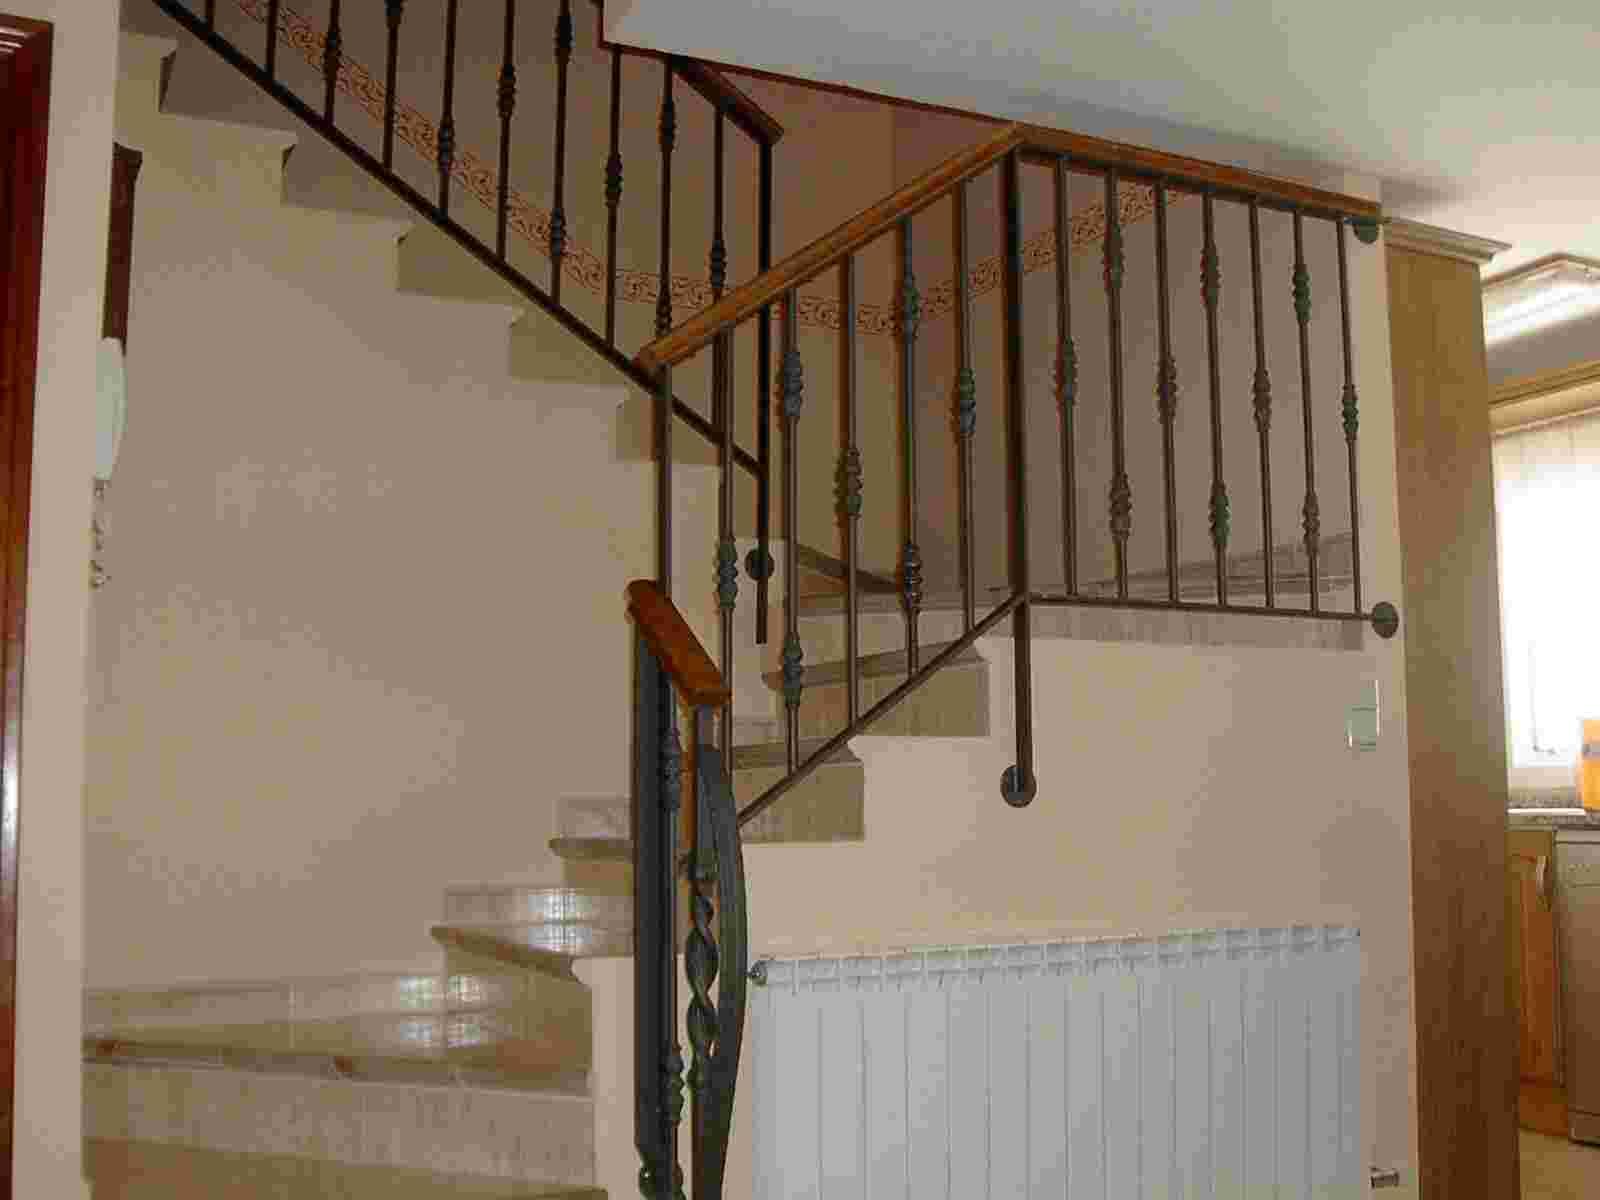 Escaleras de hierro y madera para interiores dise os for Barandas de madera para escaleras interiores